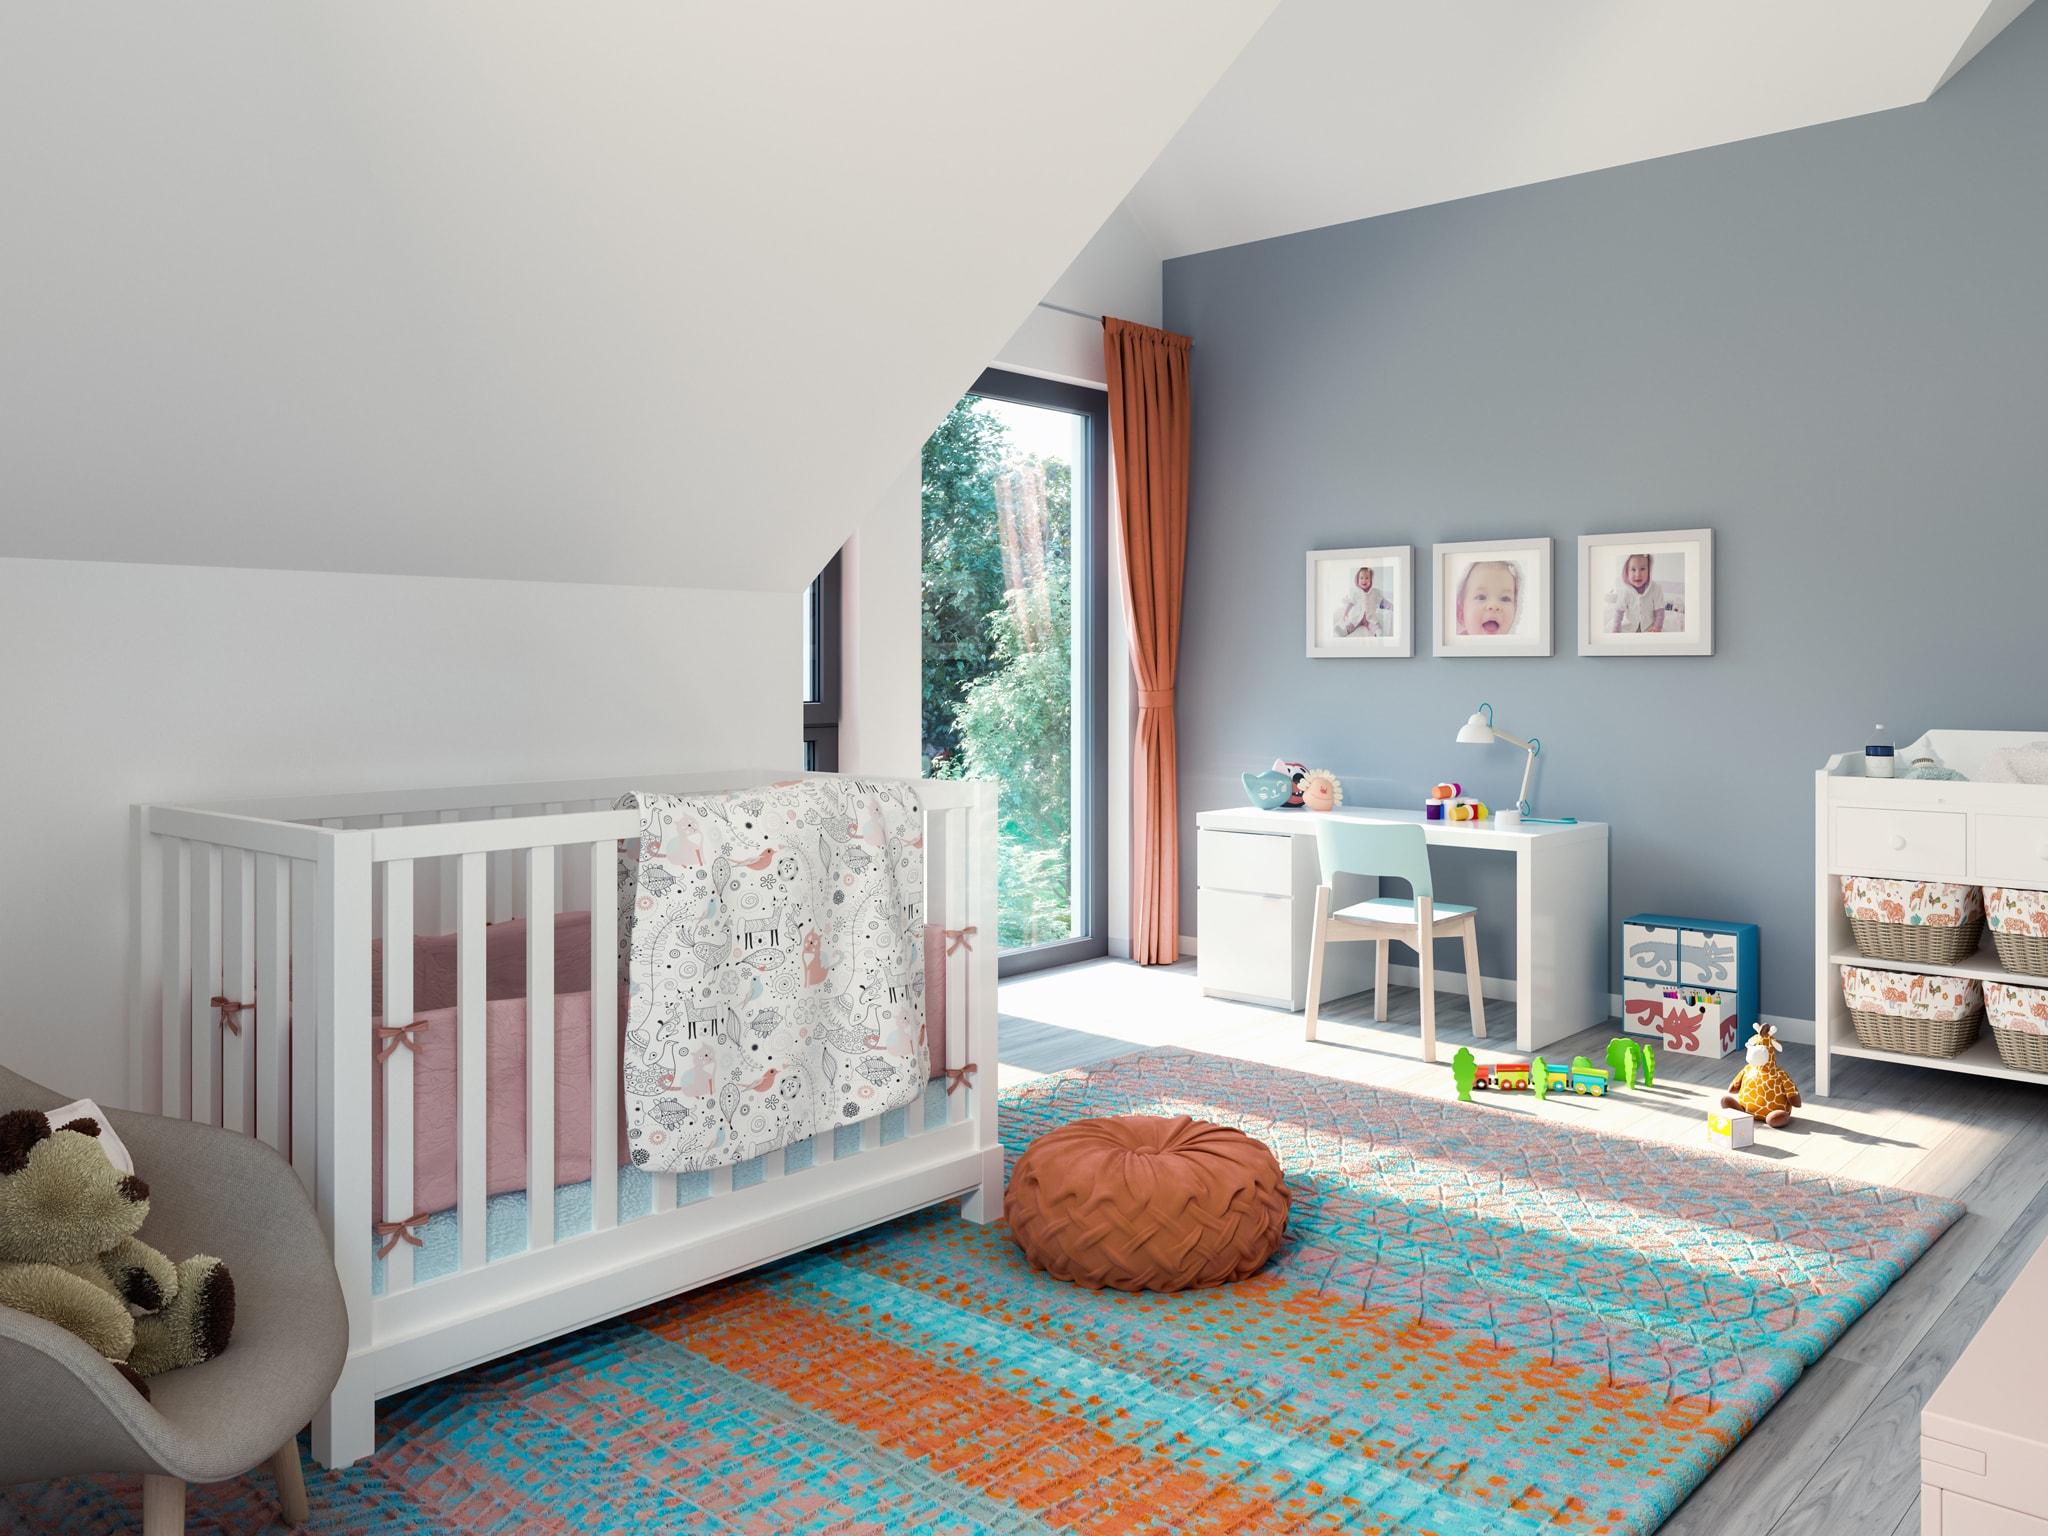 Kinderzimmer mit Dachschräge - Ideen Inneneinrichtung Fertighaus Living Haus SUNSHINE 144 V3 - HausbauDirekt.de